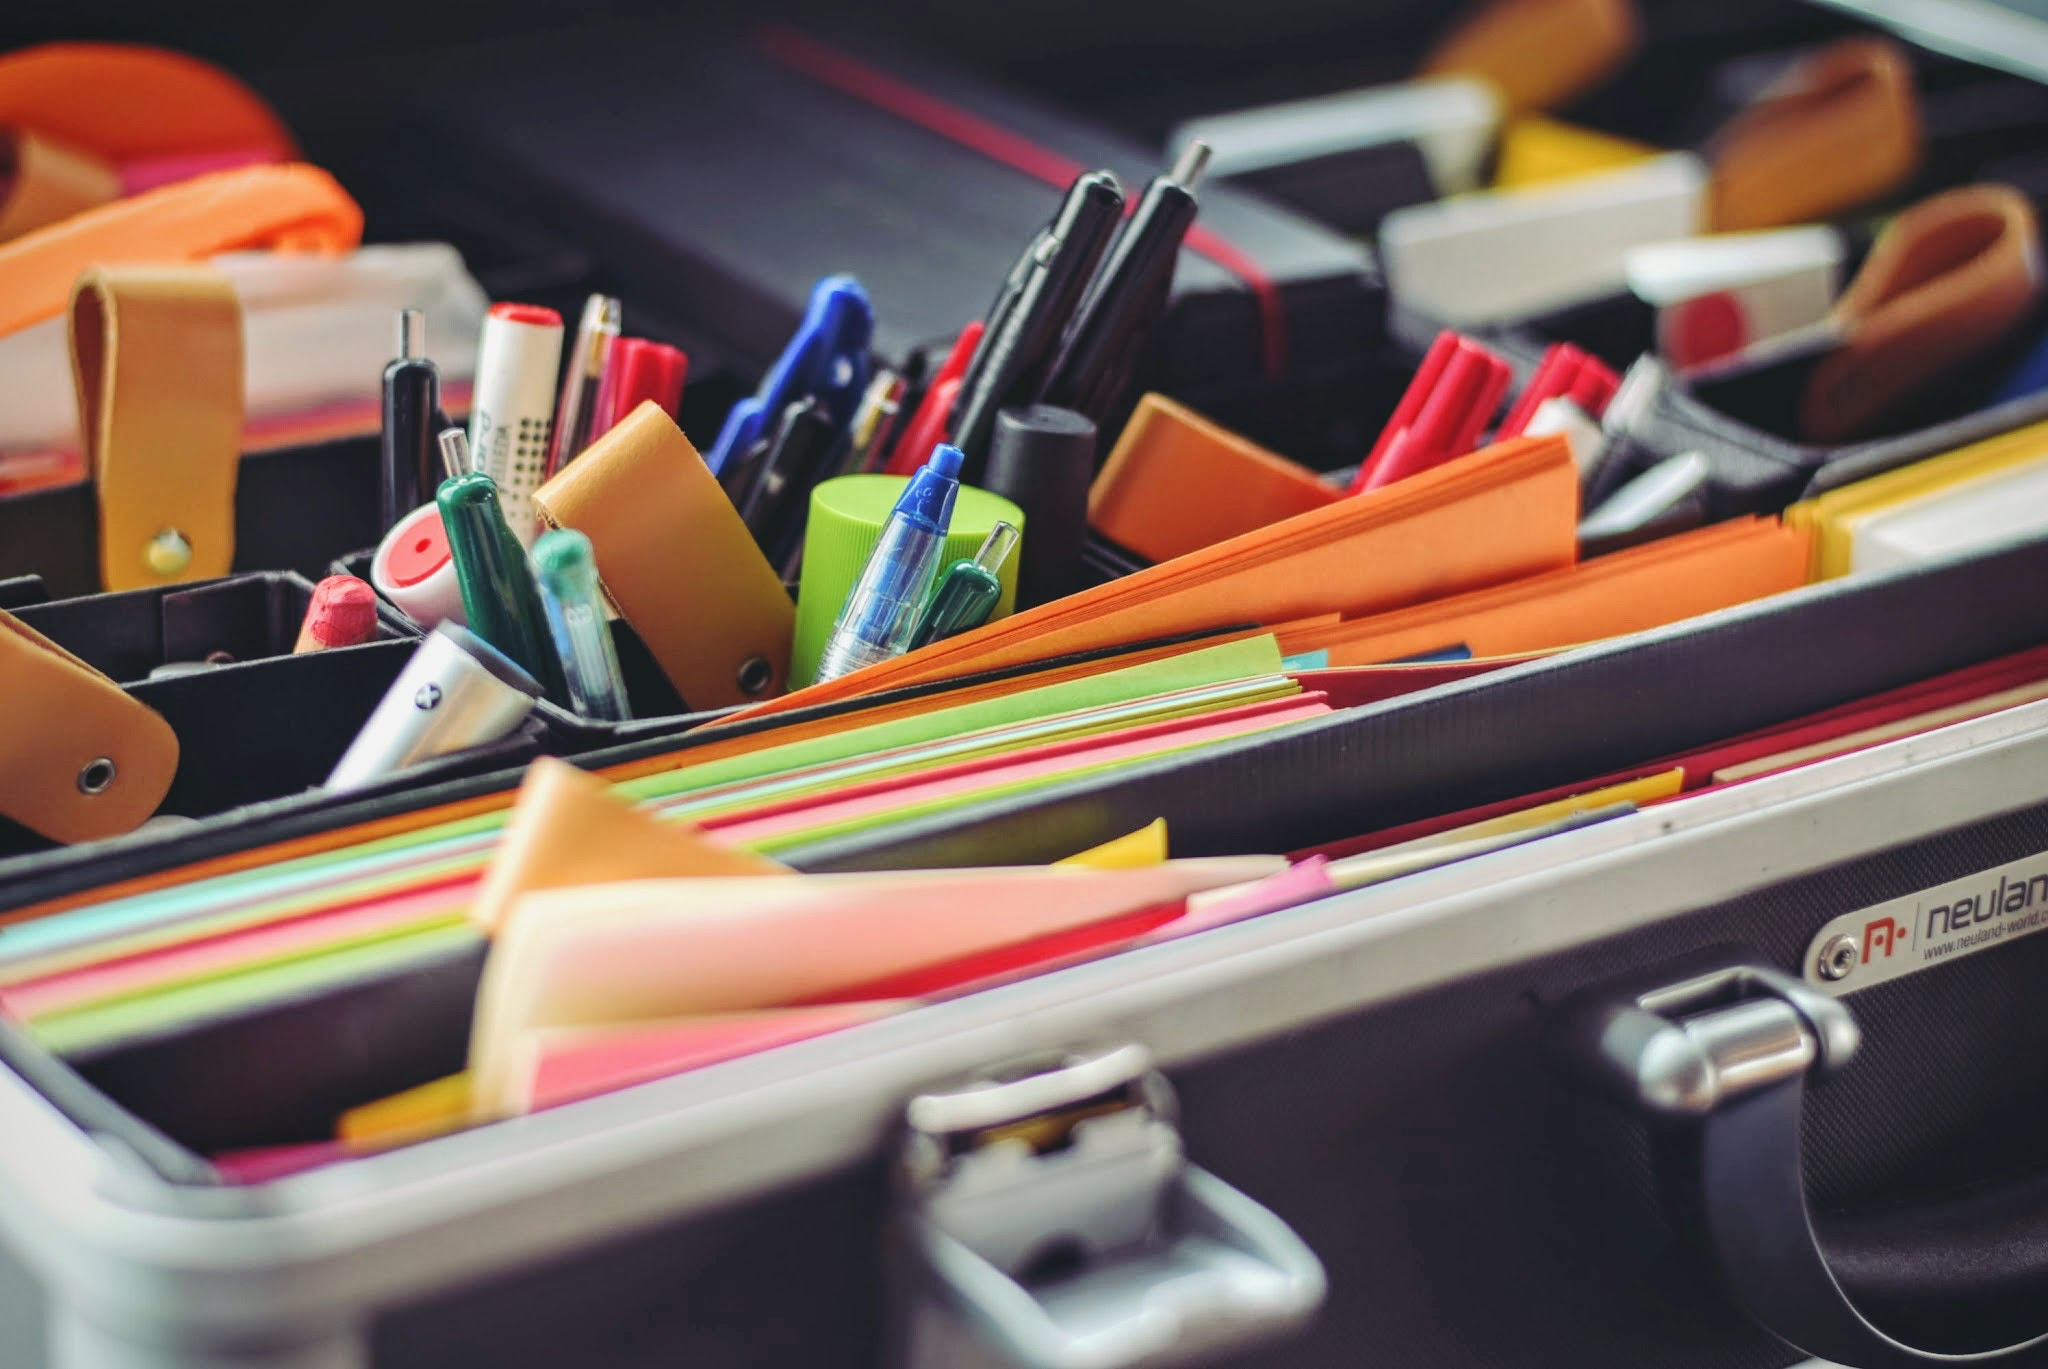 Filing a Title IX Report